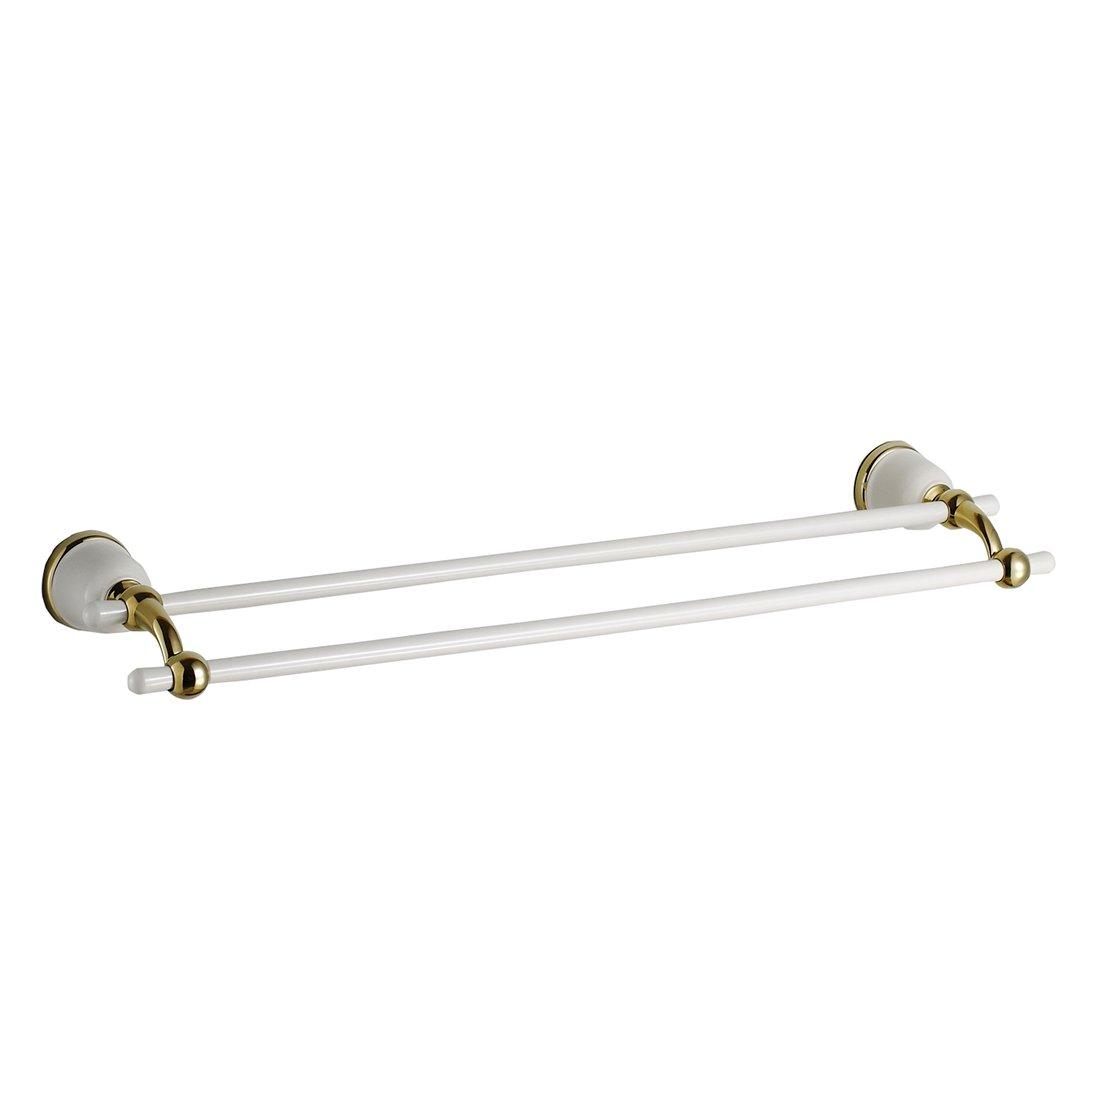 Inchant Modern White Double Towel Bar Solid Brass Bathroom Kitchen Towel Rack Holder Wall mounted Lavatory towel Hanger rail ,Shelf Rack Hanging Towel for Bath Storage - 26 inch